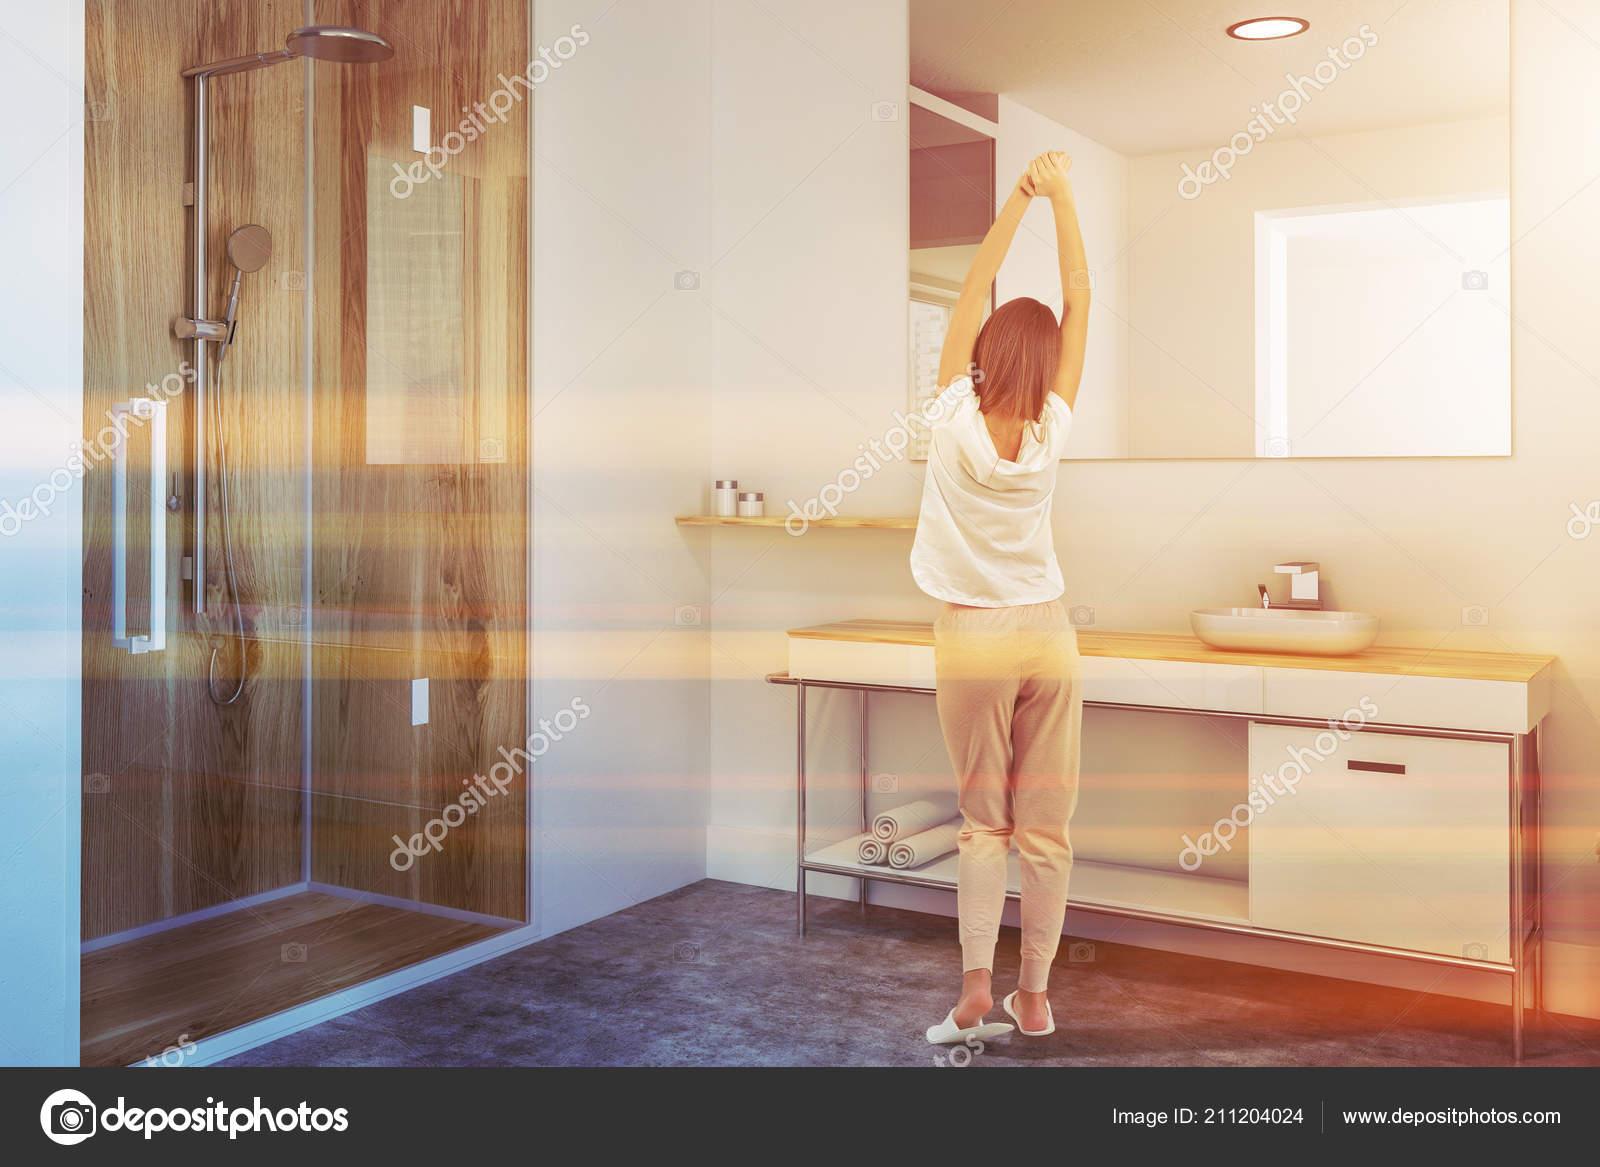 Mujer Interior Cuarto Baño Lujo Con Una Ducha Madera Mueble ...